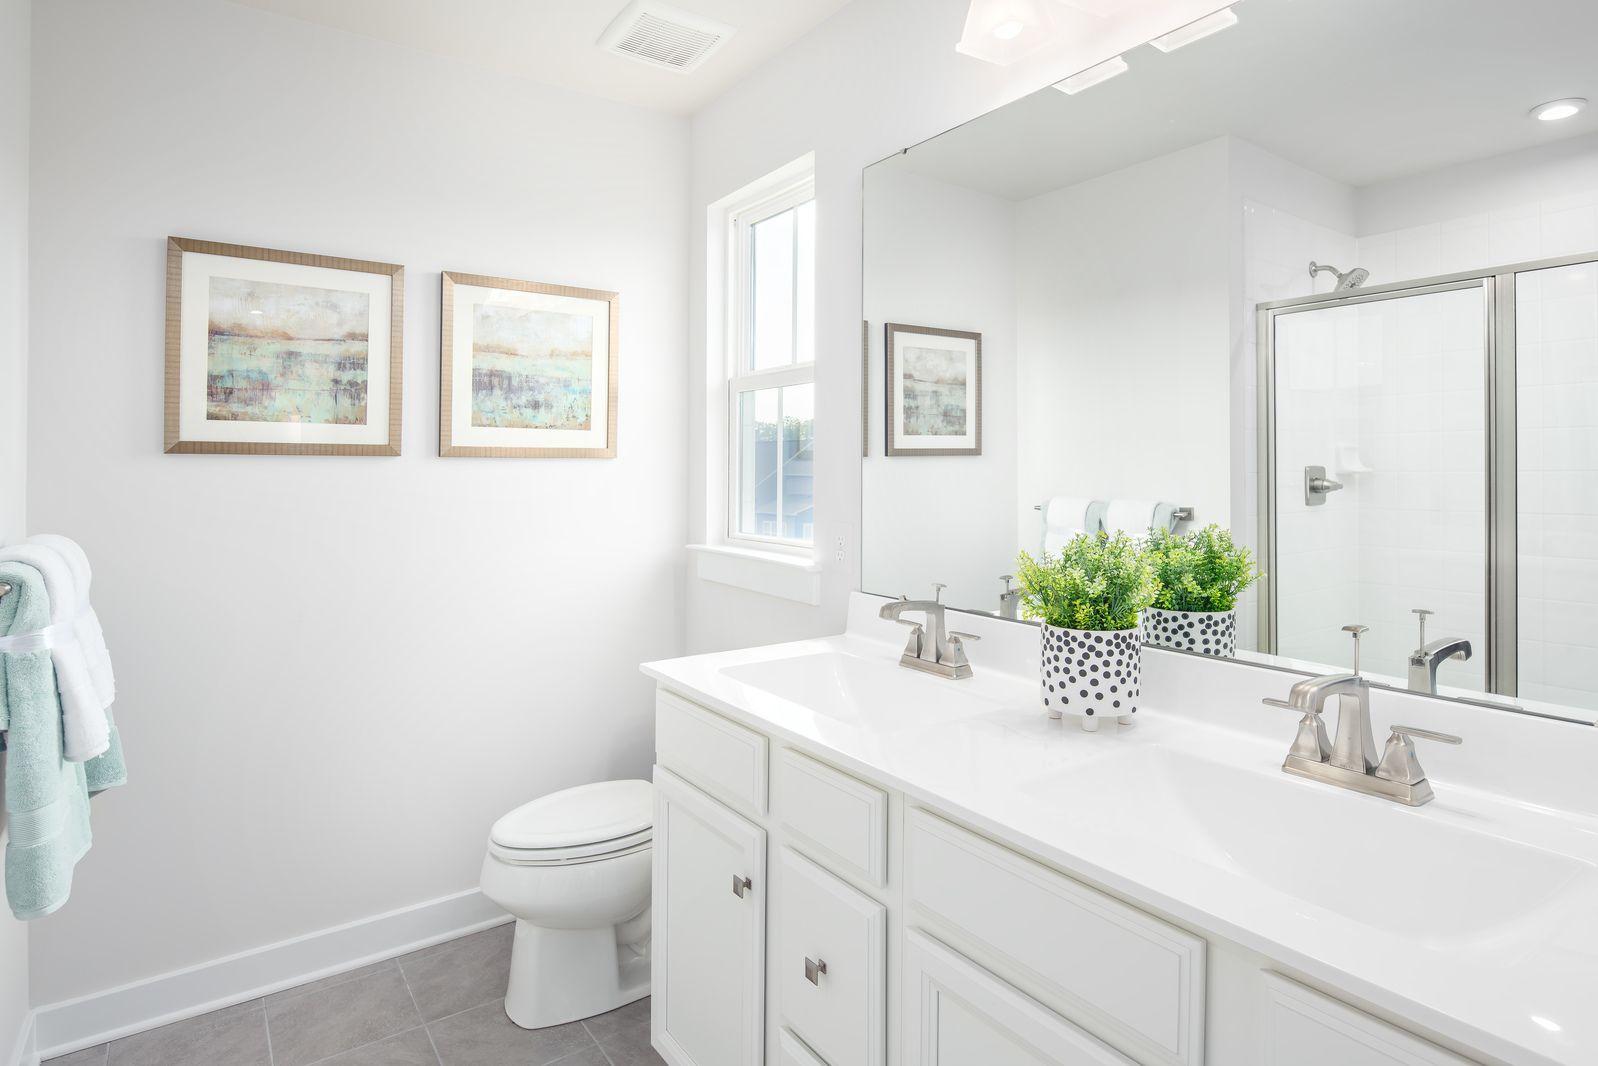 Bathroom featured in the Ballenger By HeartlandHomes in Morgantown, WV